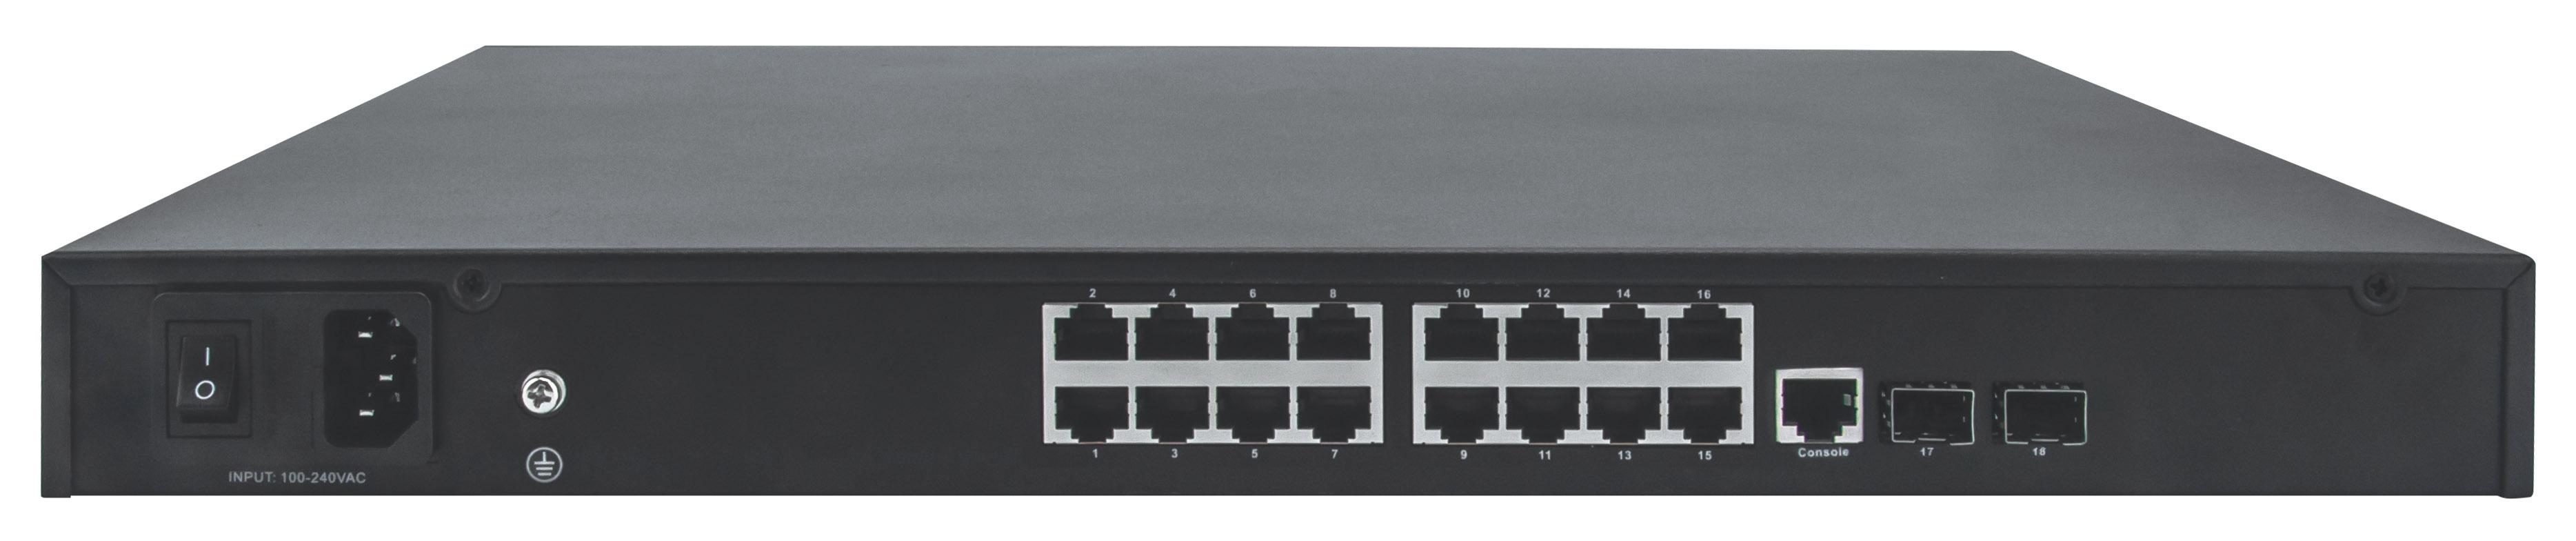 16-Port Gigabit Ethernet PoE+ Web-Managed AV Switch with 2 SFP Uplinks